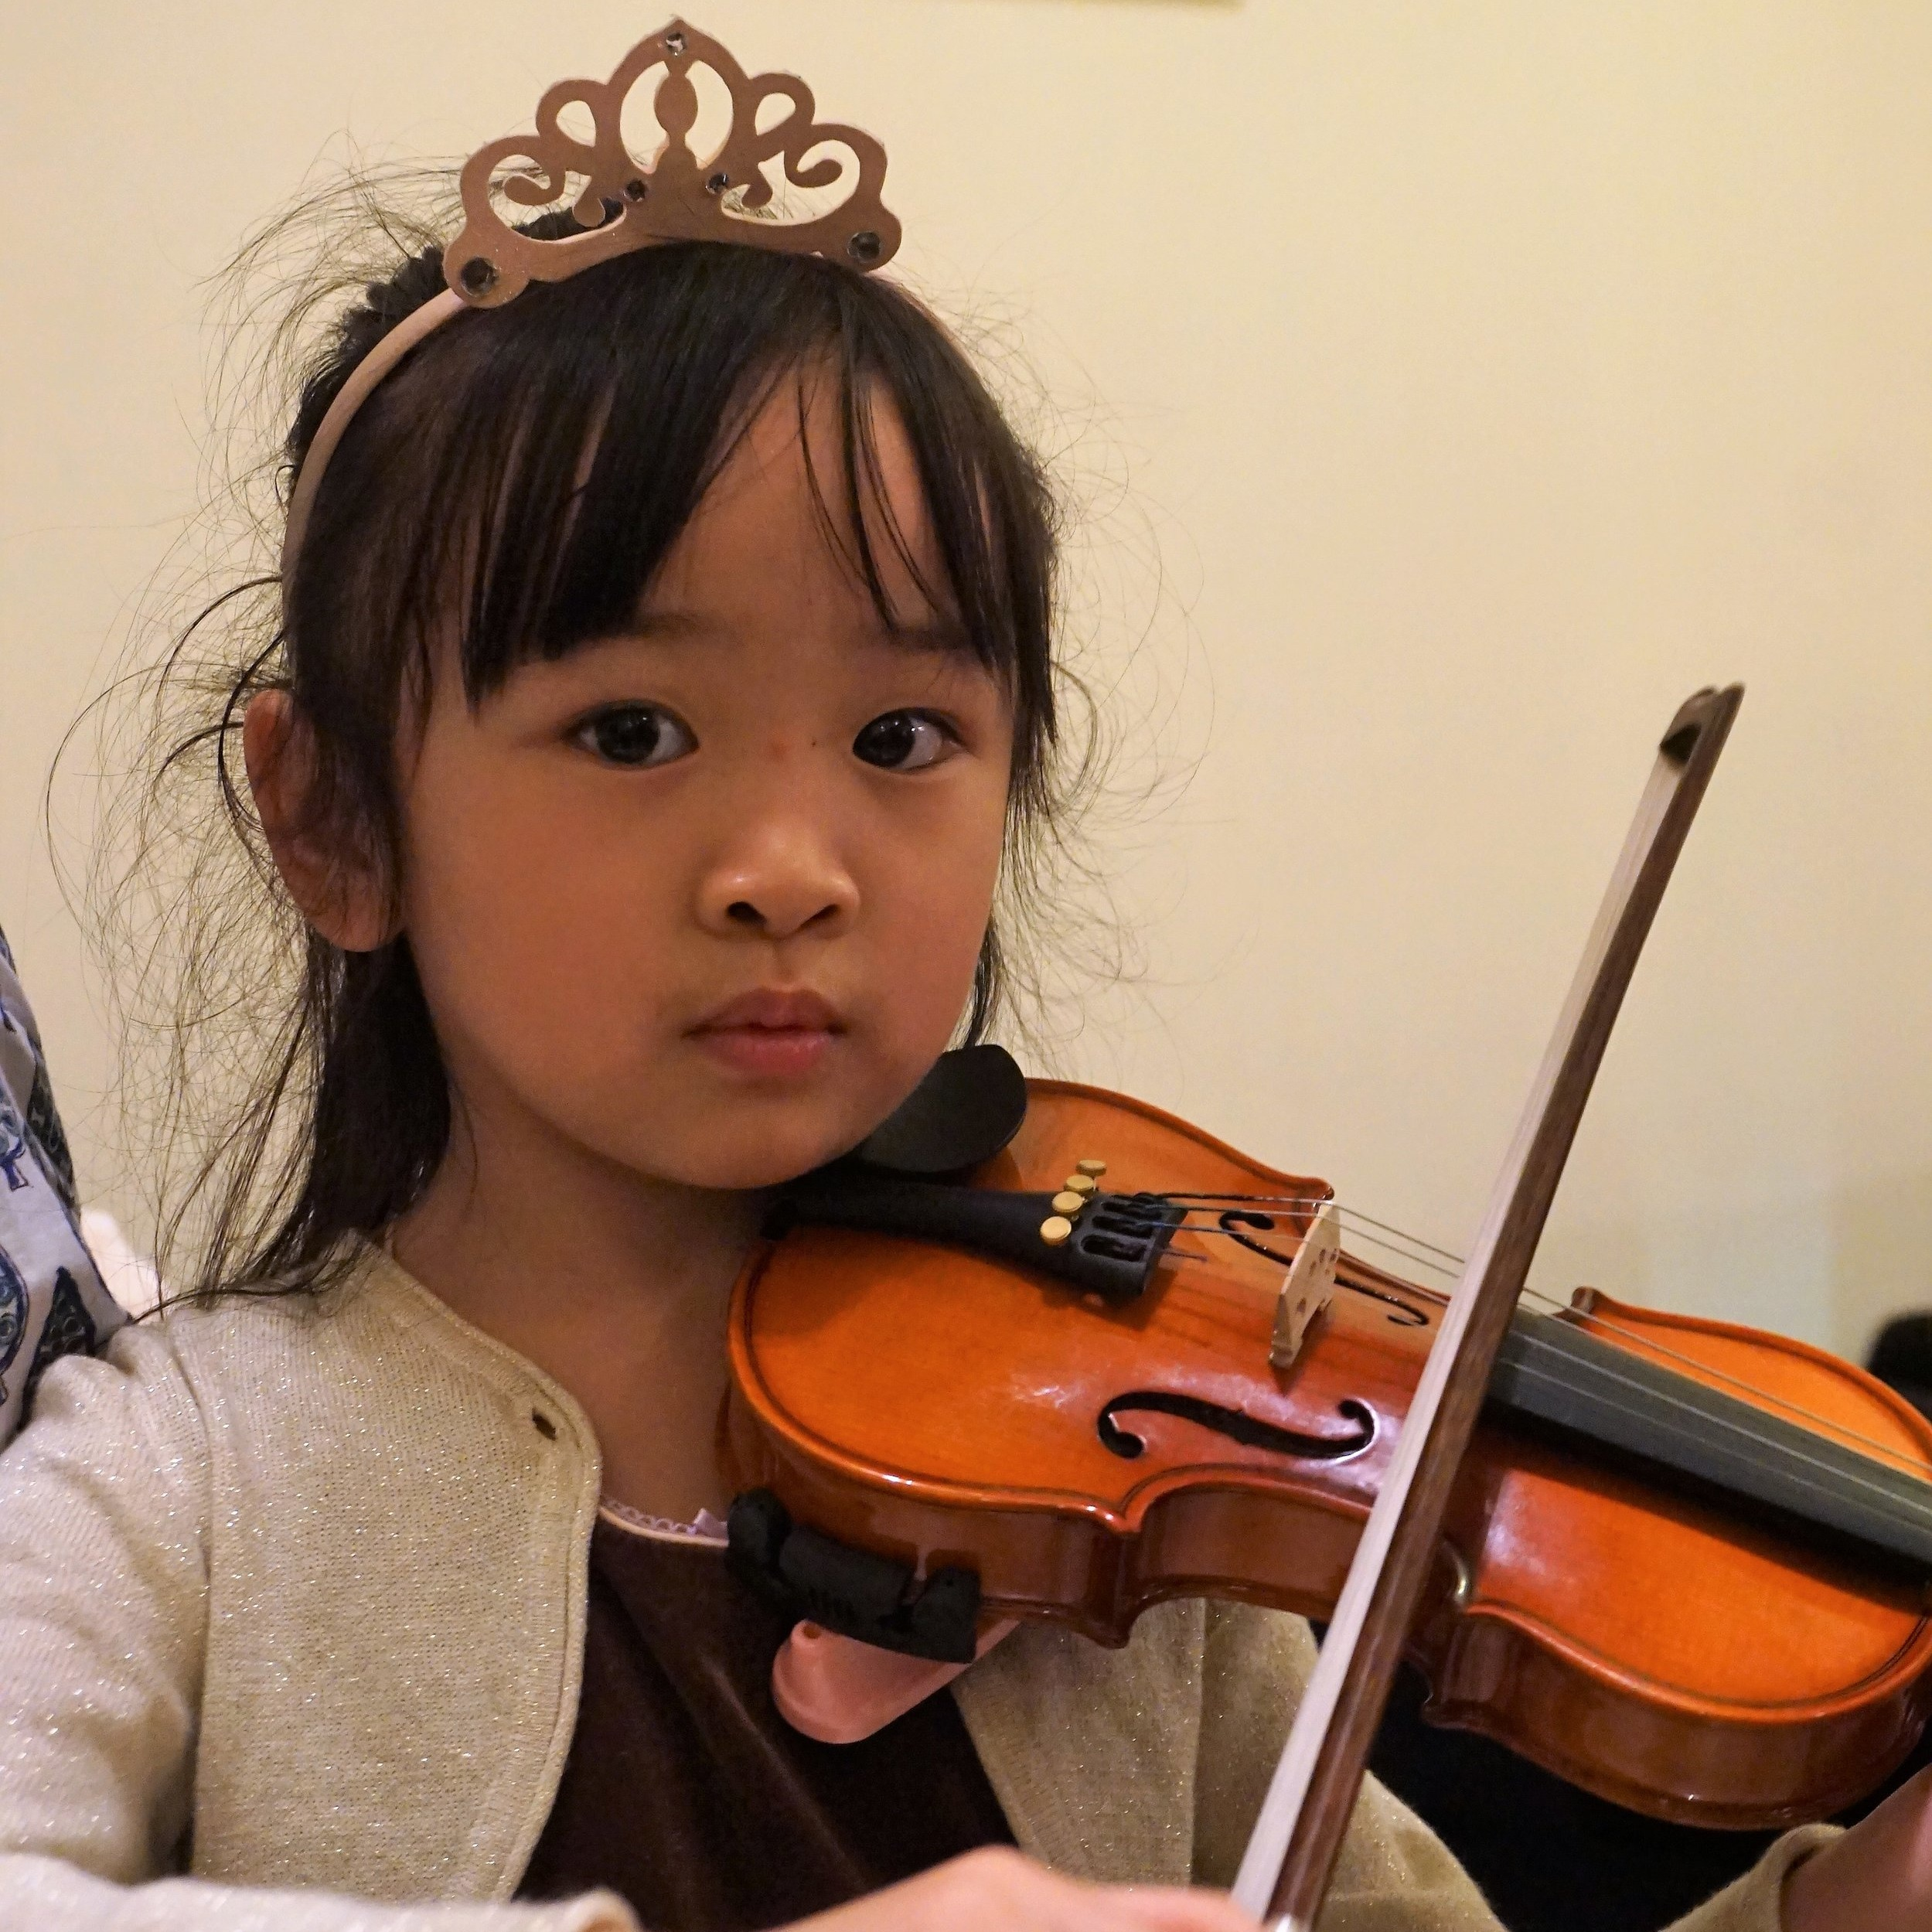 WU JIA LUN  (2018) Prep Test for Violin